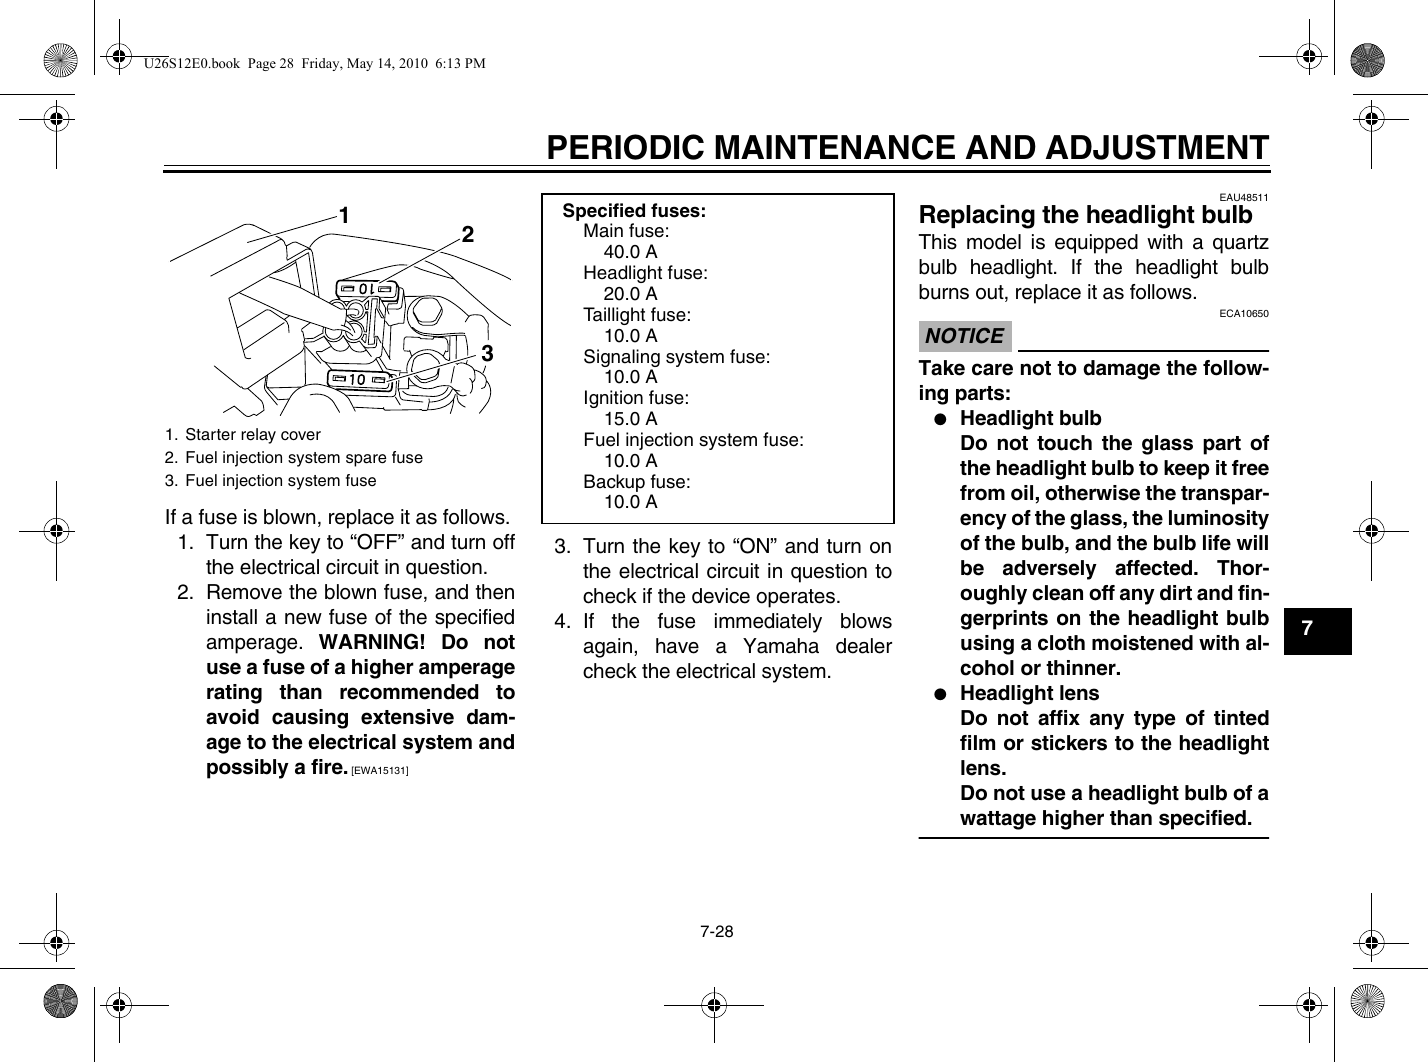 Yamaha 2011 V Star 950 Tourer Owners Manual